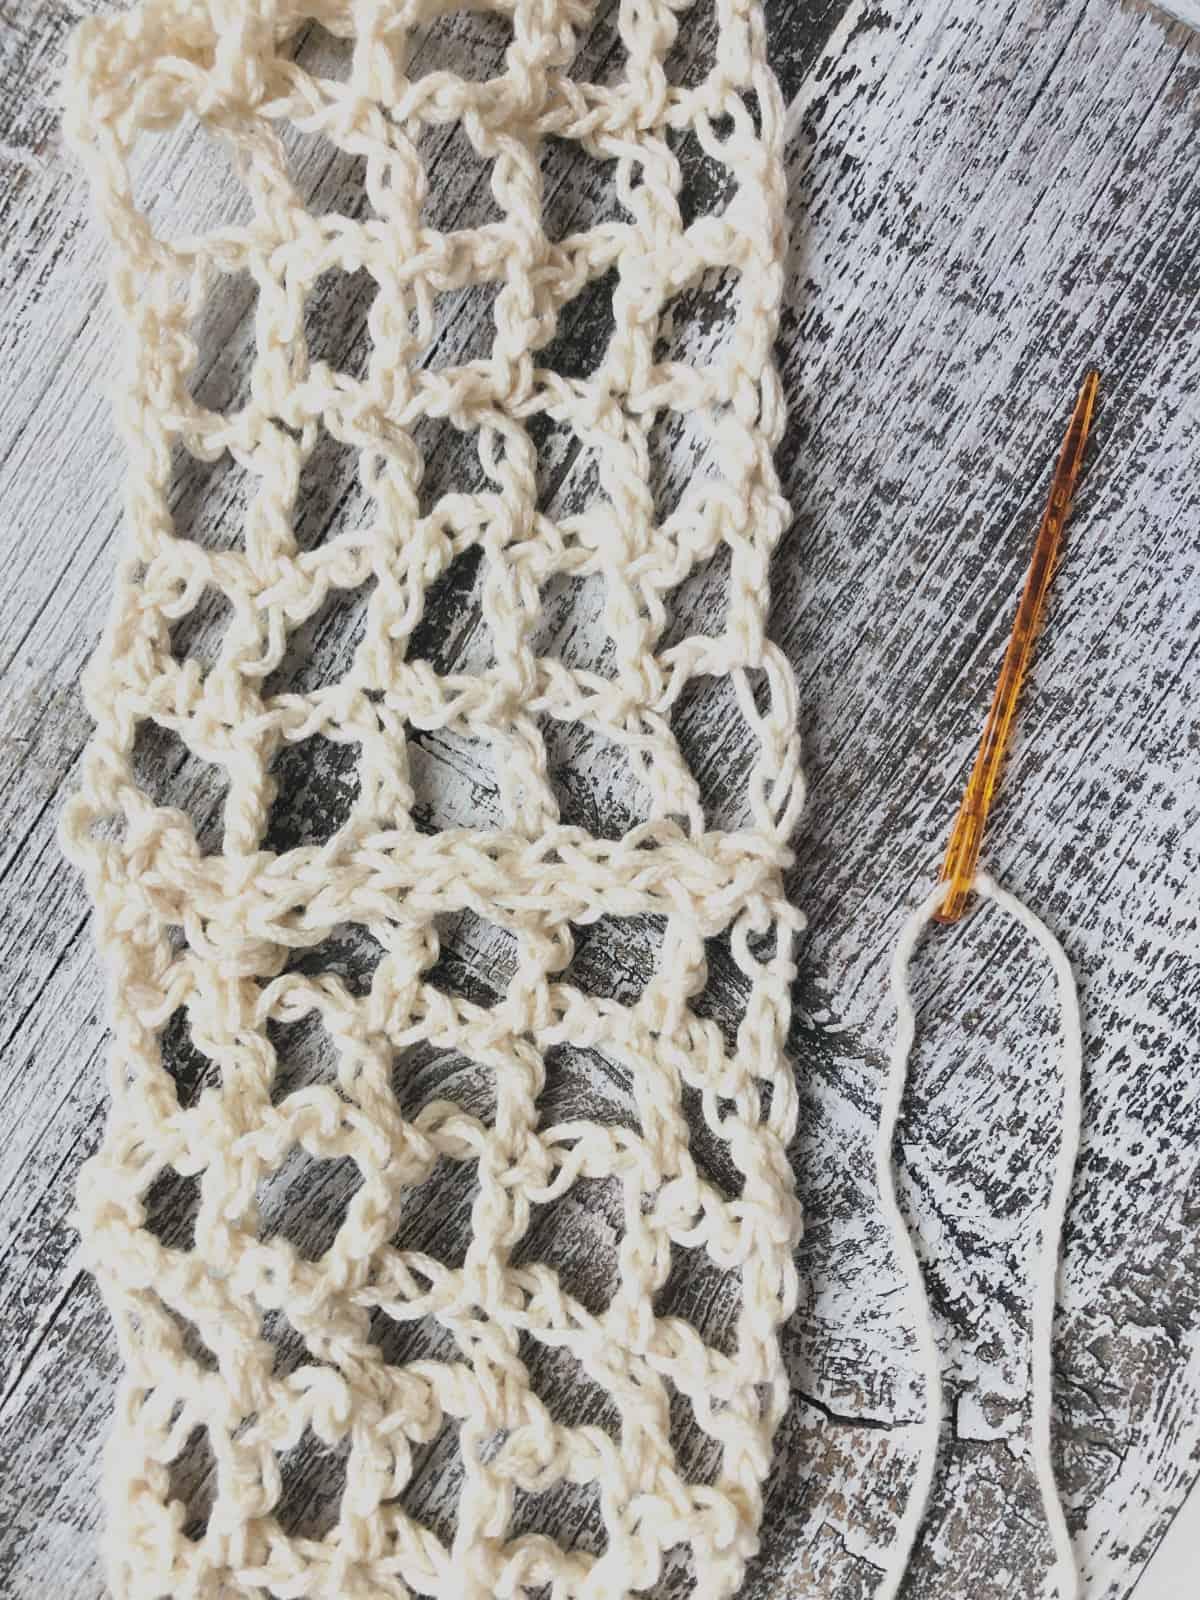 Infinity cowl seam with yarn needle.